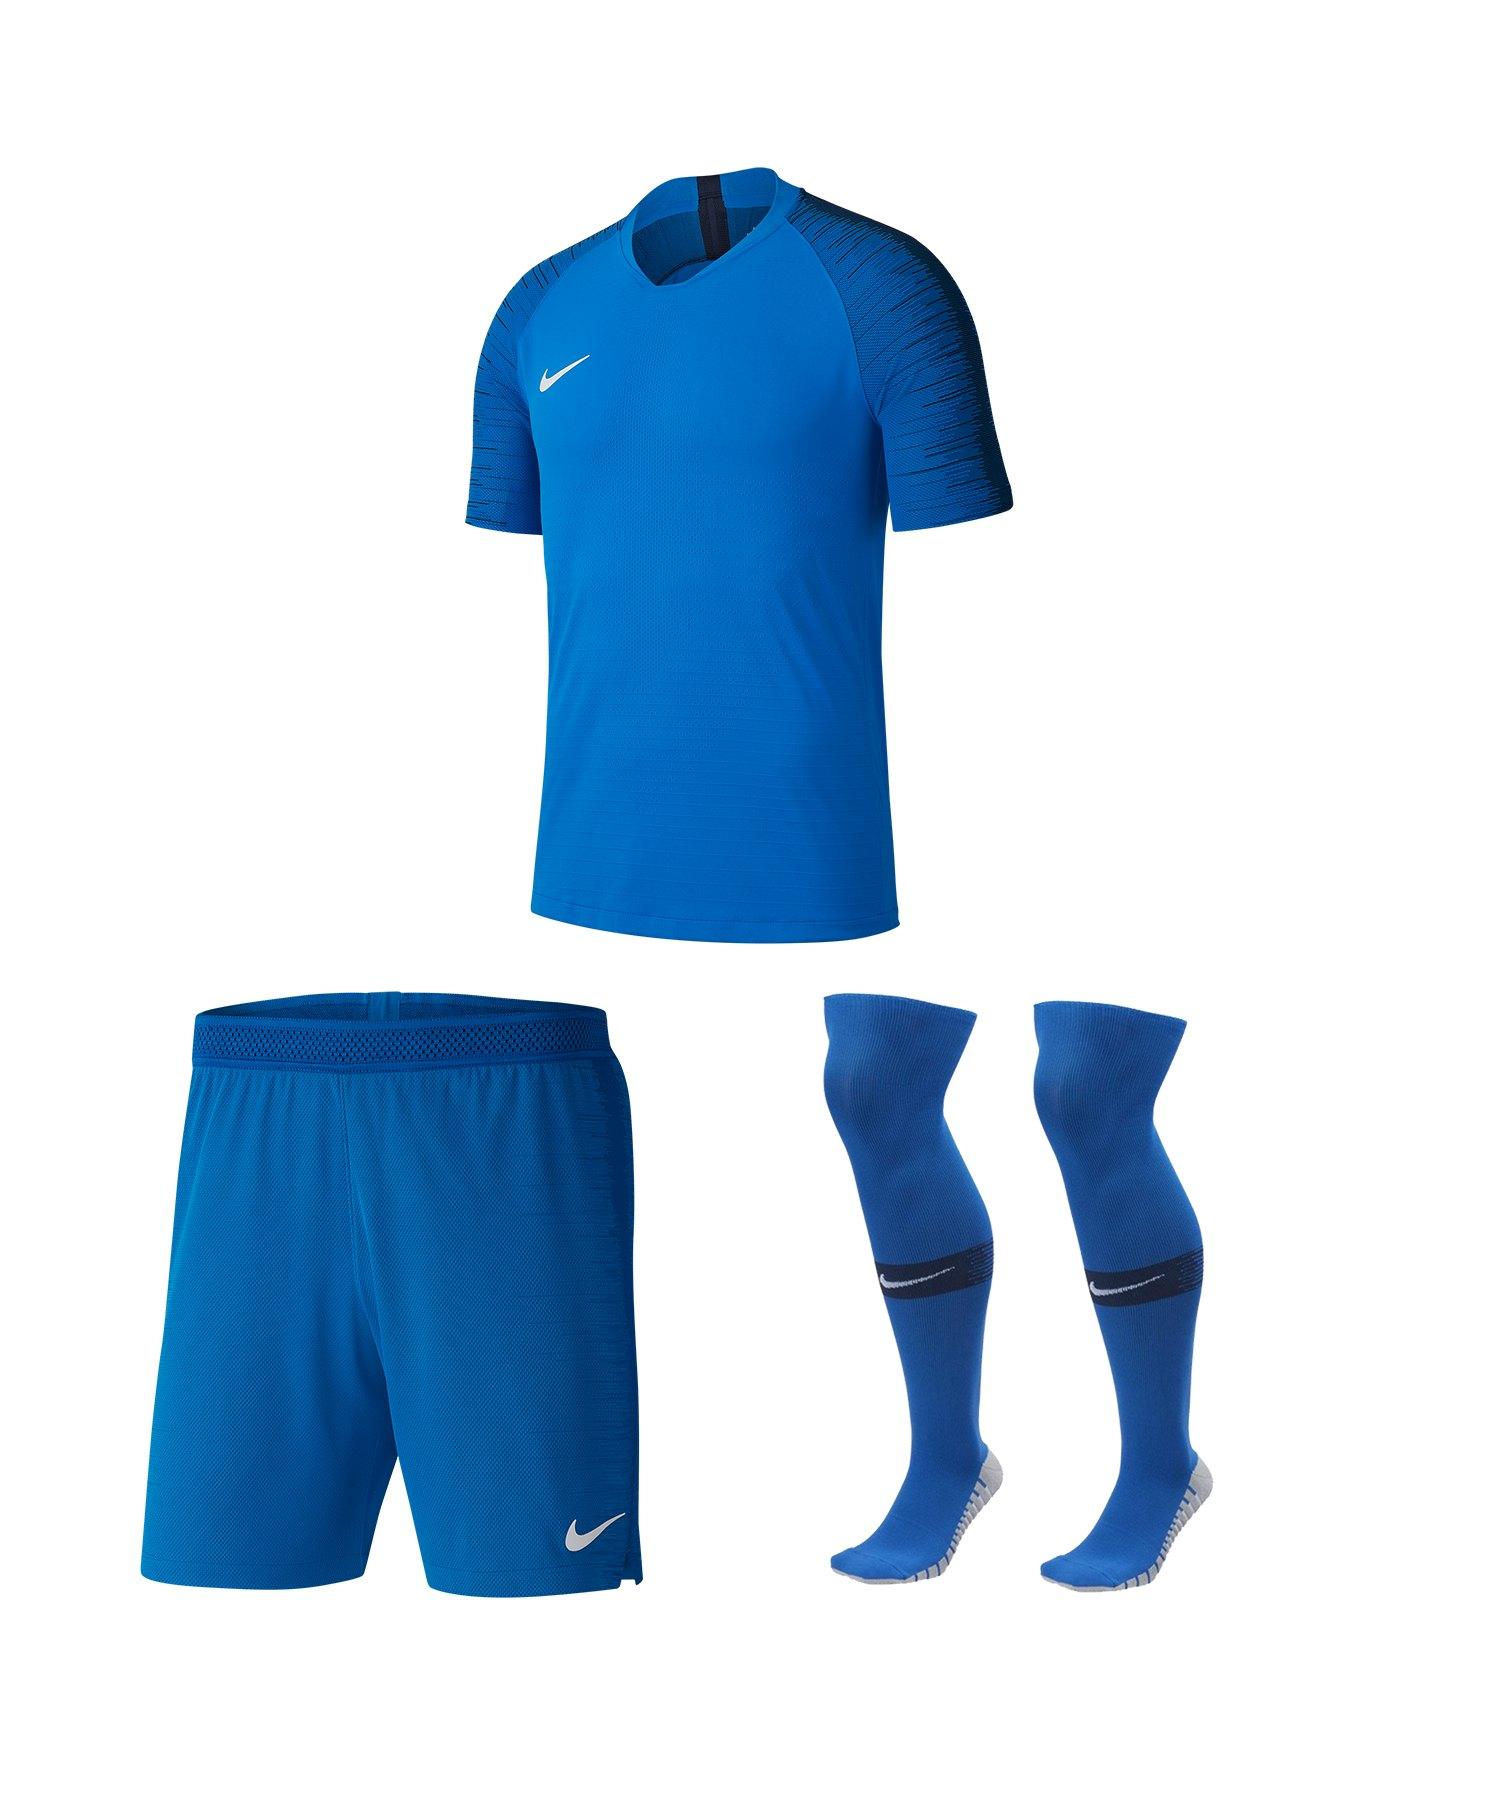 Nike Vaporknit II Trikotset kurzarm Blau F463 - blau